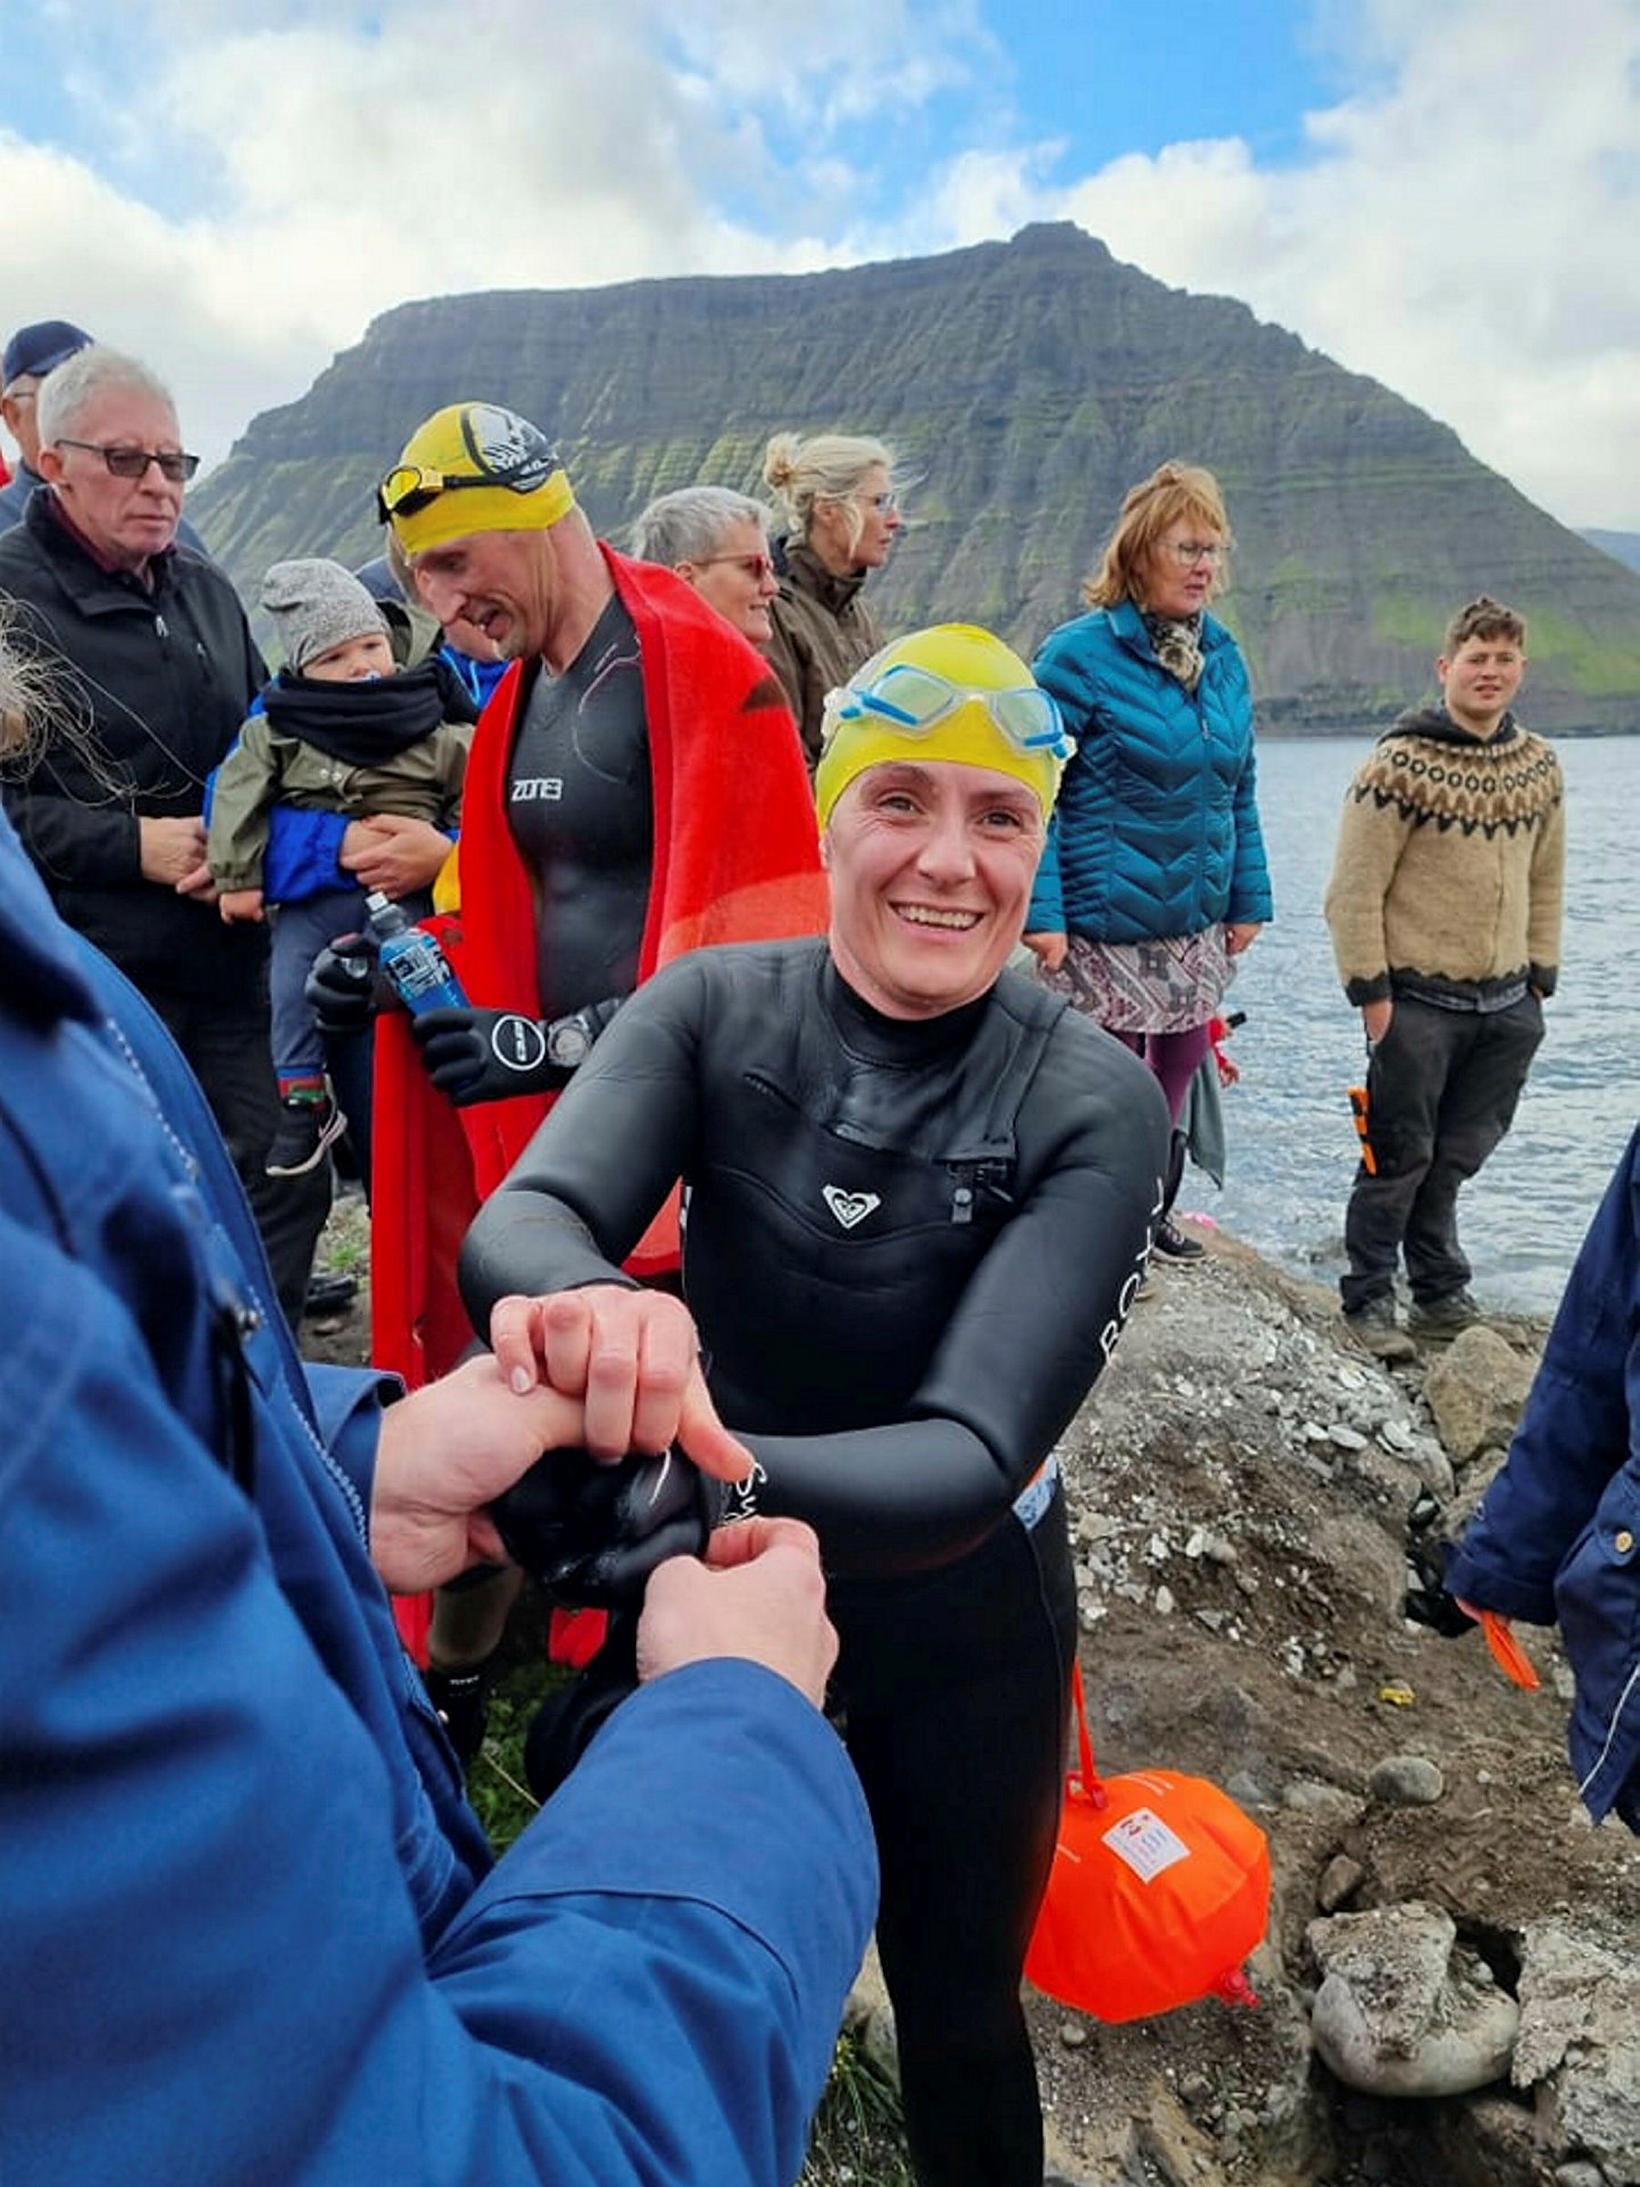 Hólmfríður Bóasdóttir, one of the participants.